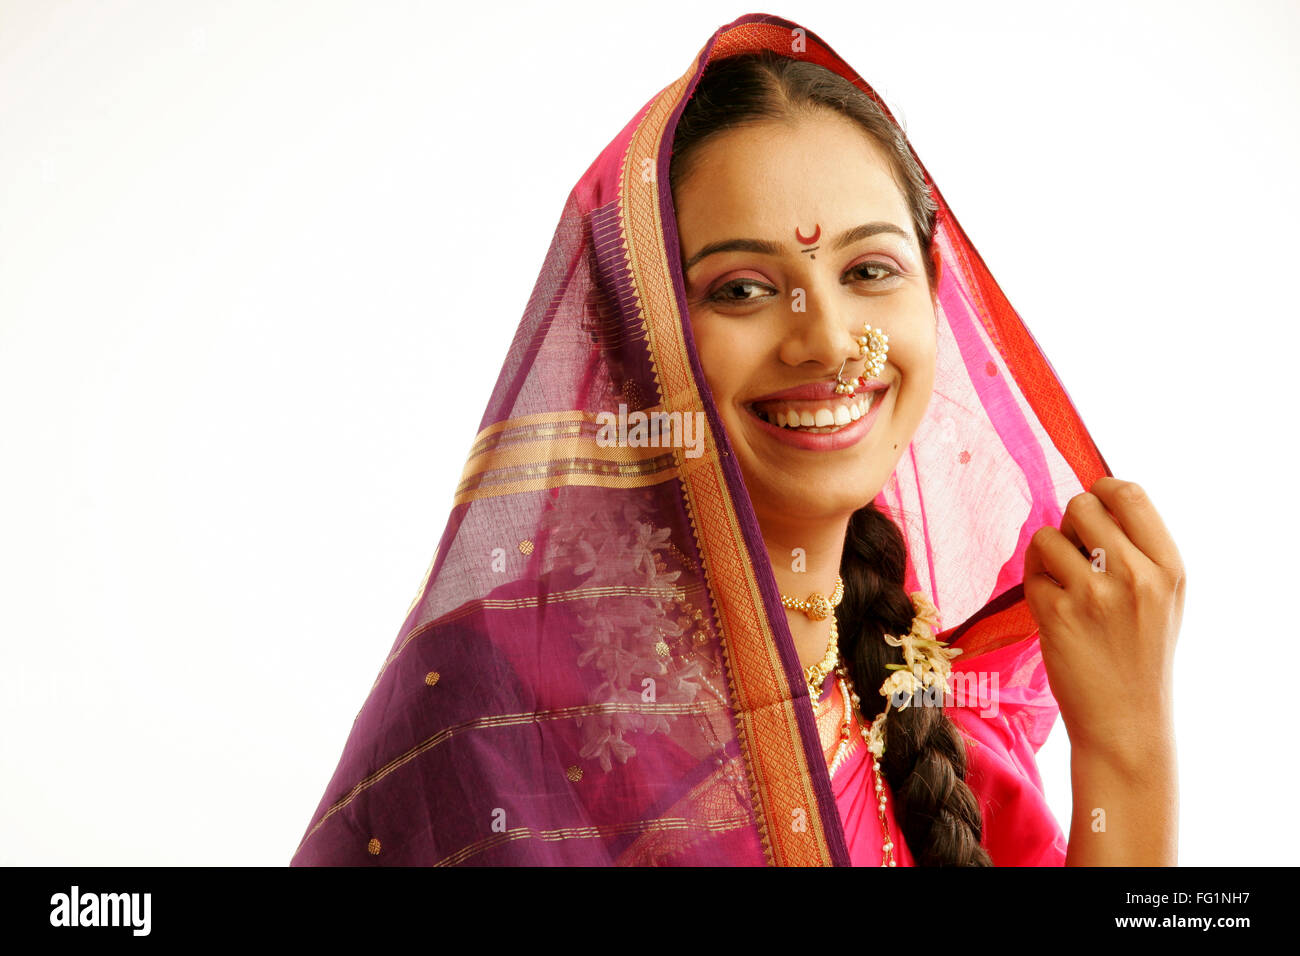 South Asian Indian Maharashtrian ragazza indossando il tradizionale navwari nove yard sari appropriate jewelry ghirlanda Immagini Stock